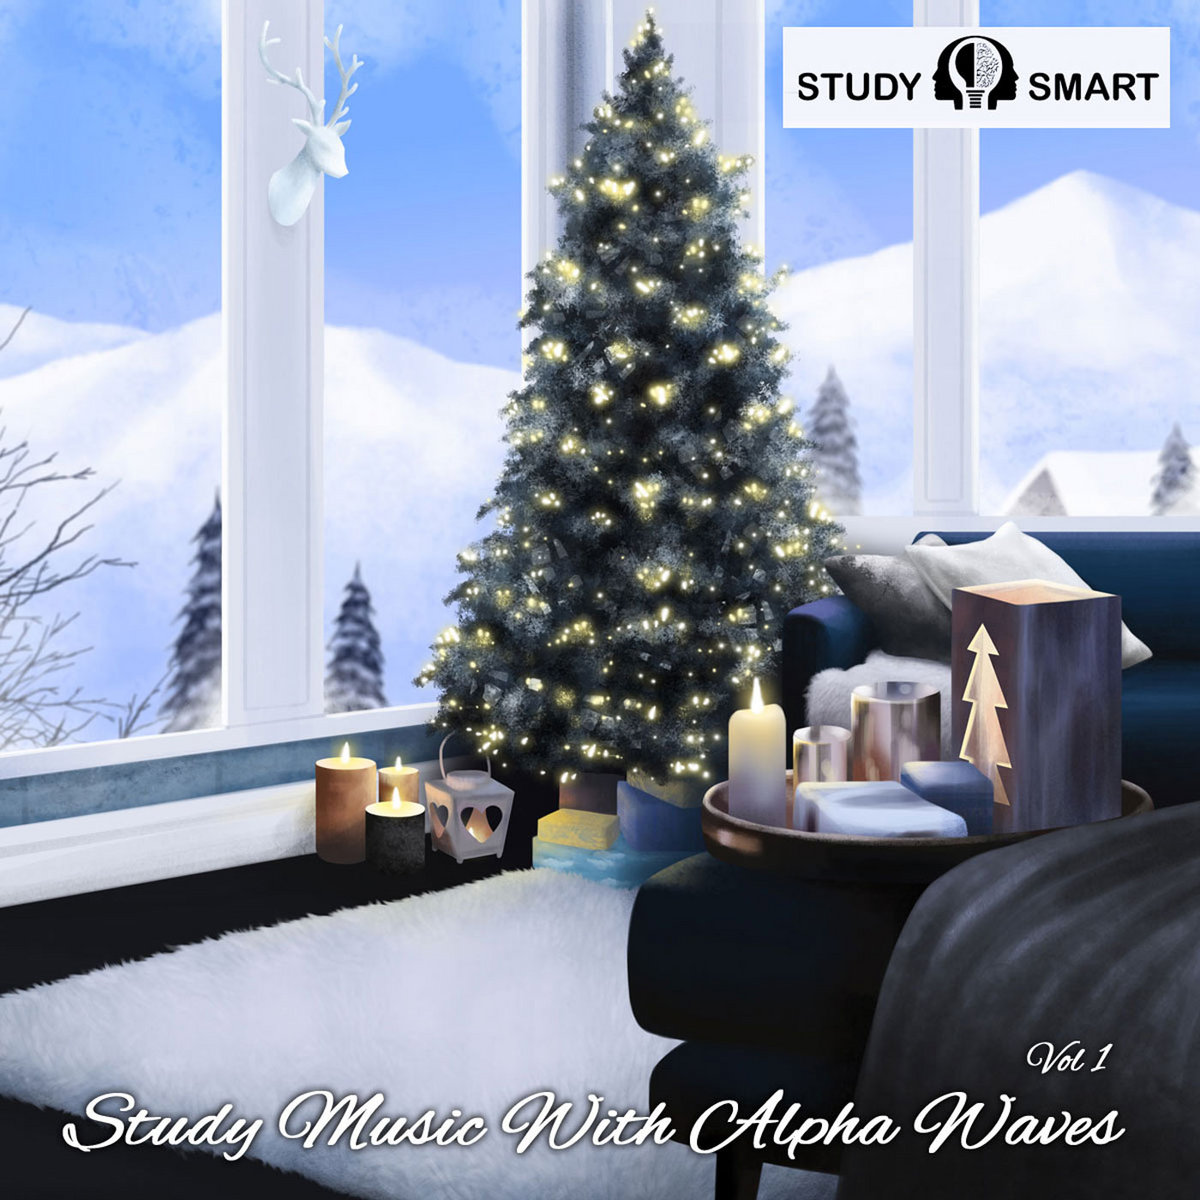 Study Music With Binaural Alpha Waves (Vol 1) | STUDY SMART